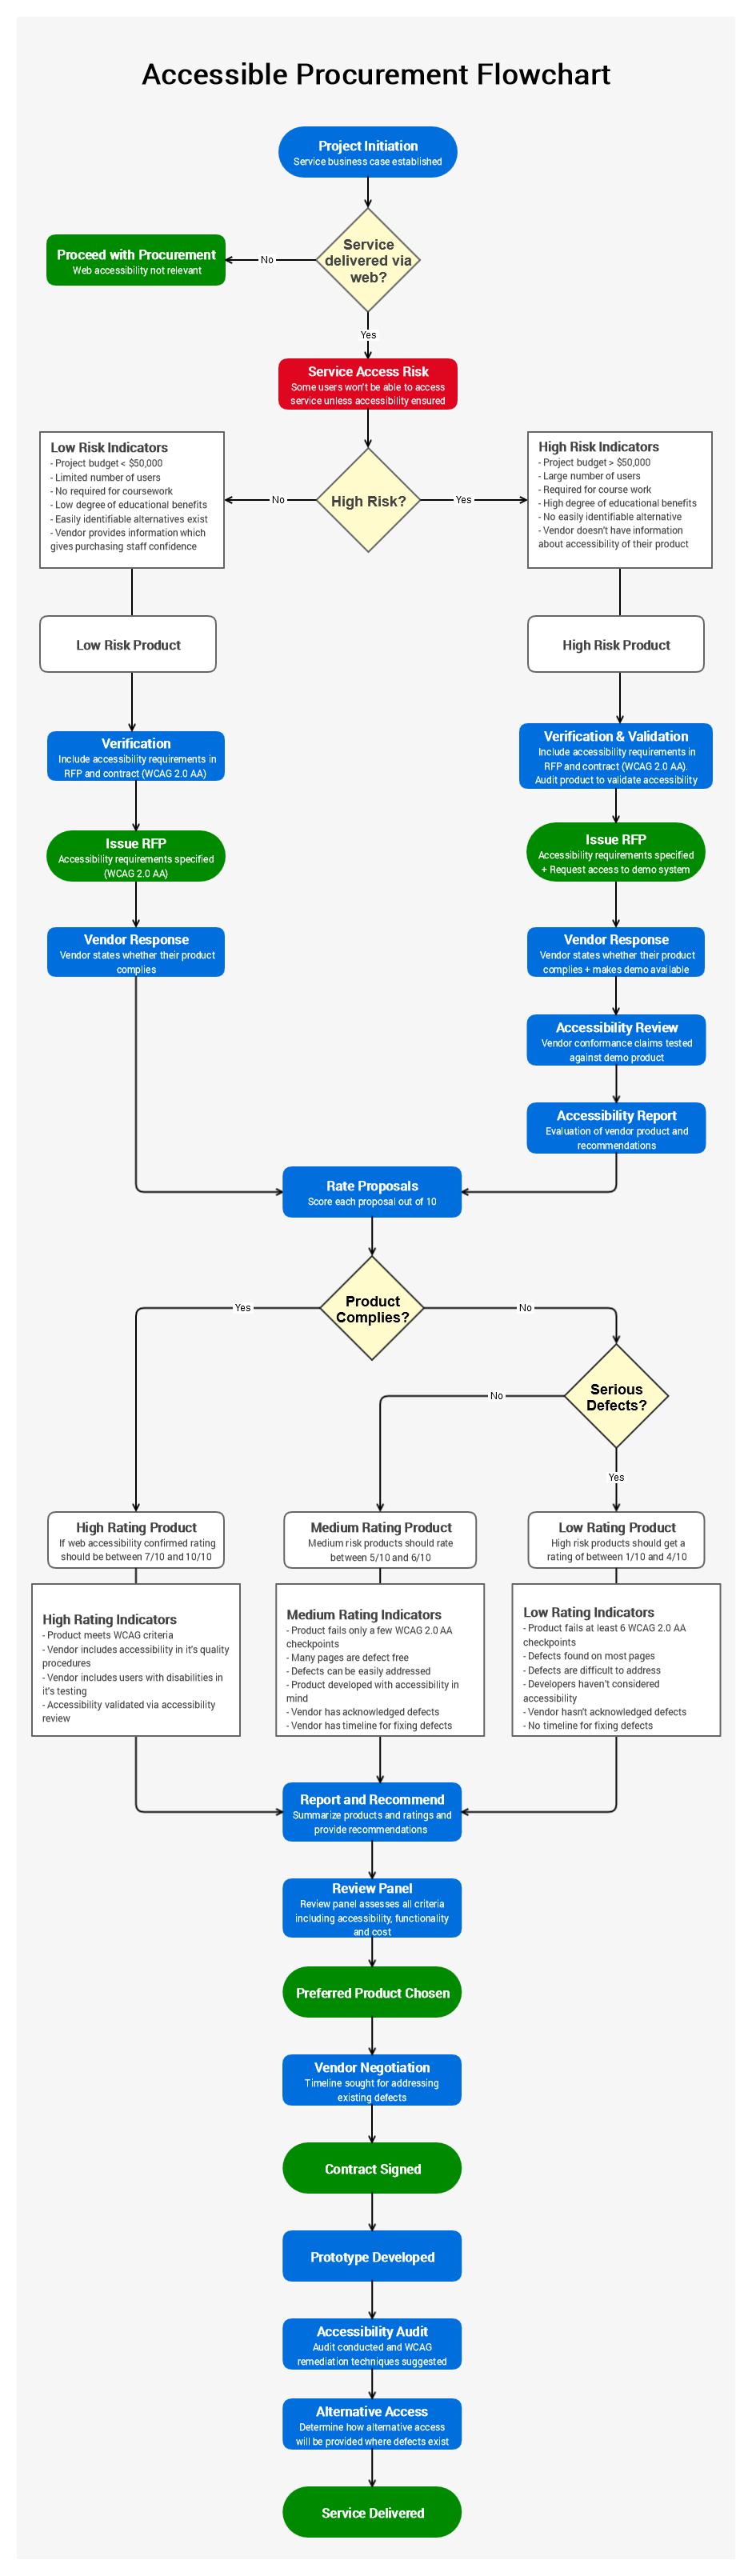 Flowchart showing stops in procurement process